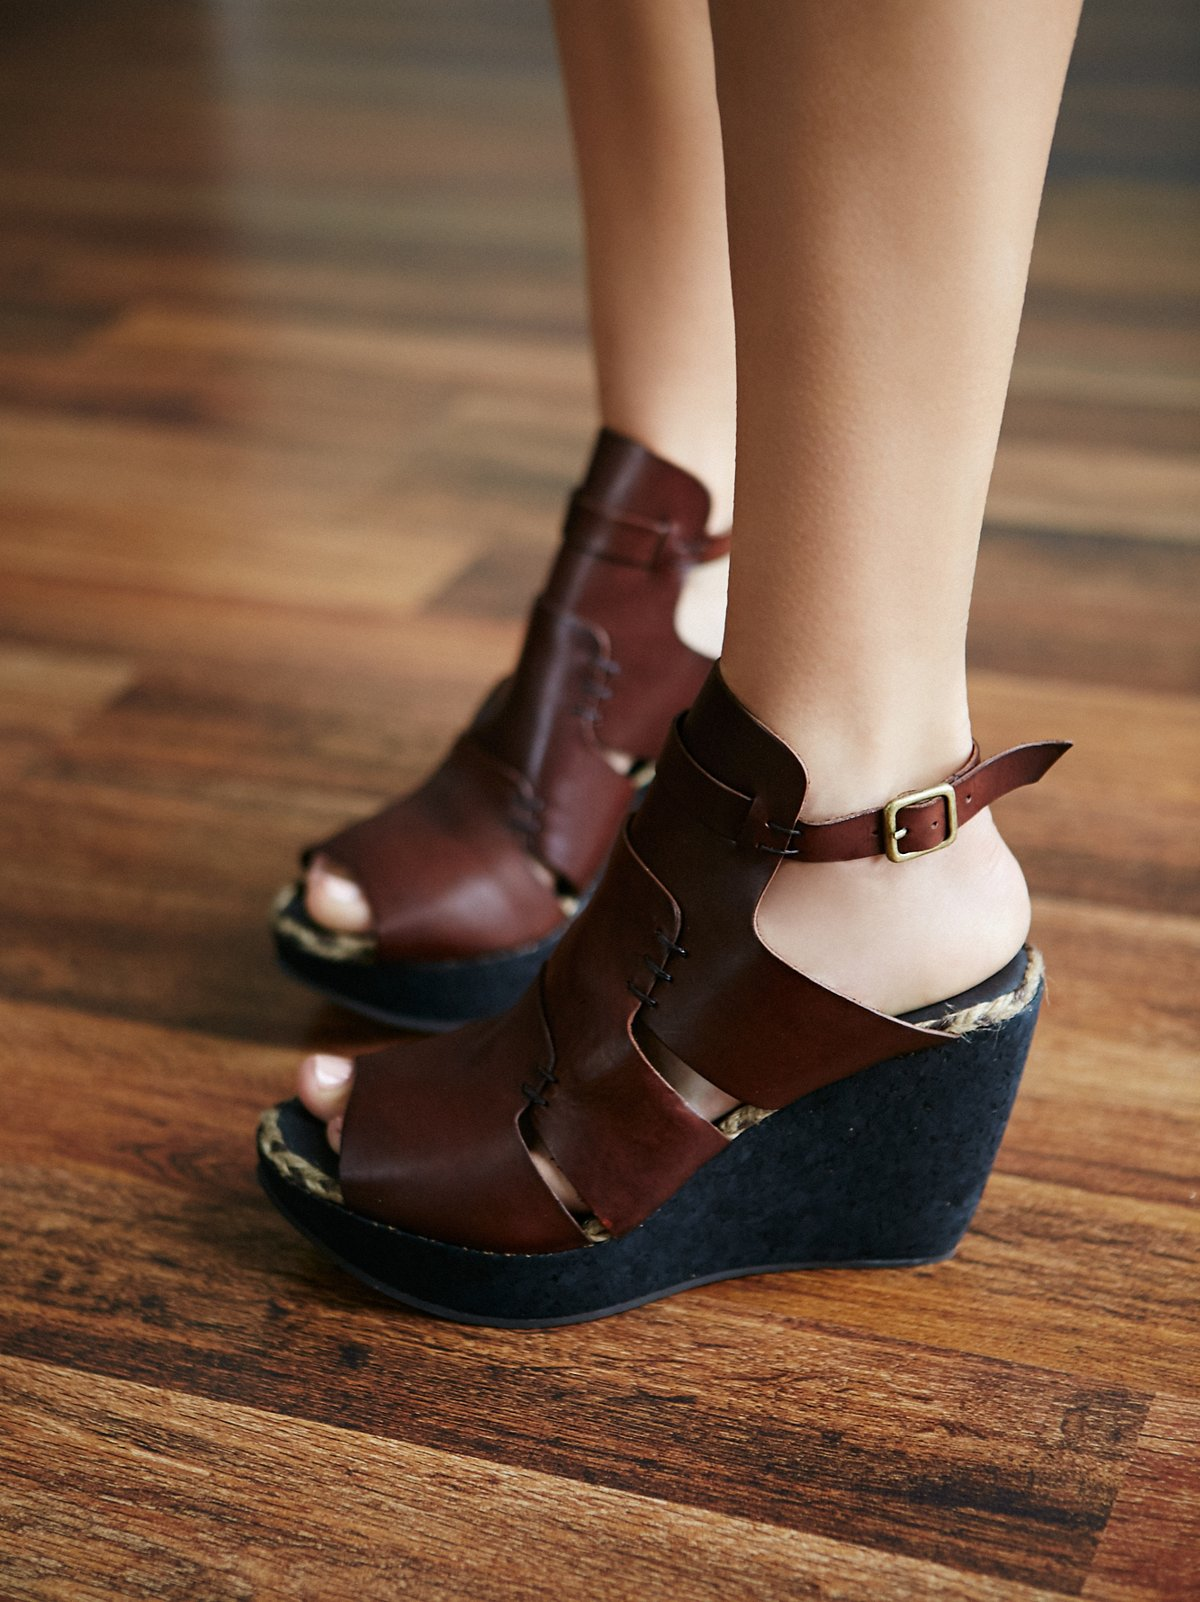 Vachetta Rose坡跟鞋